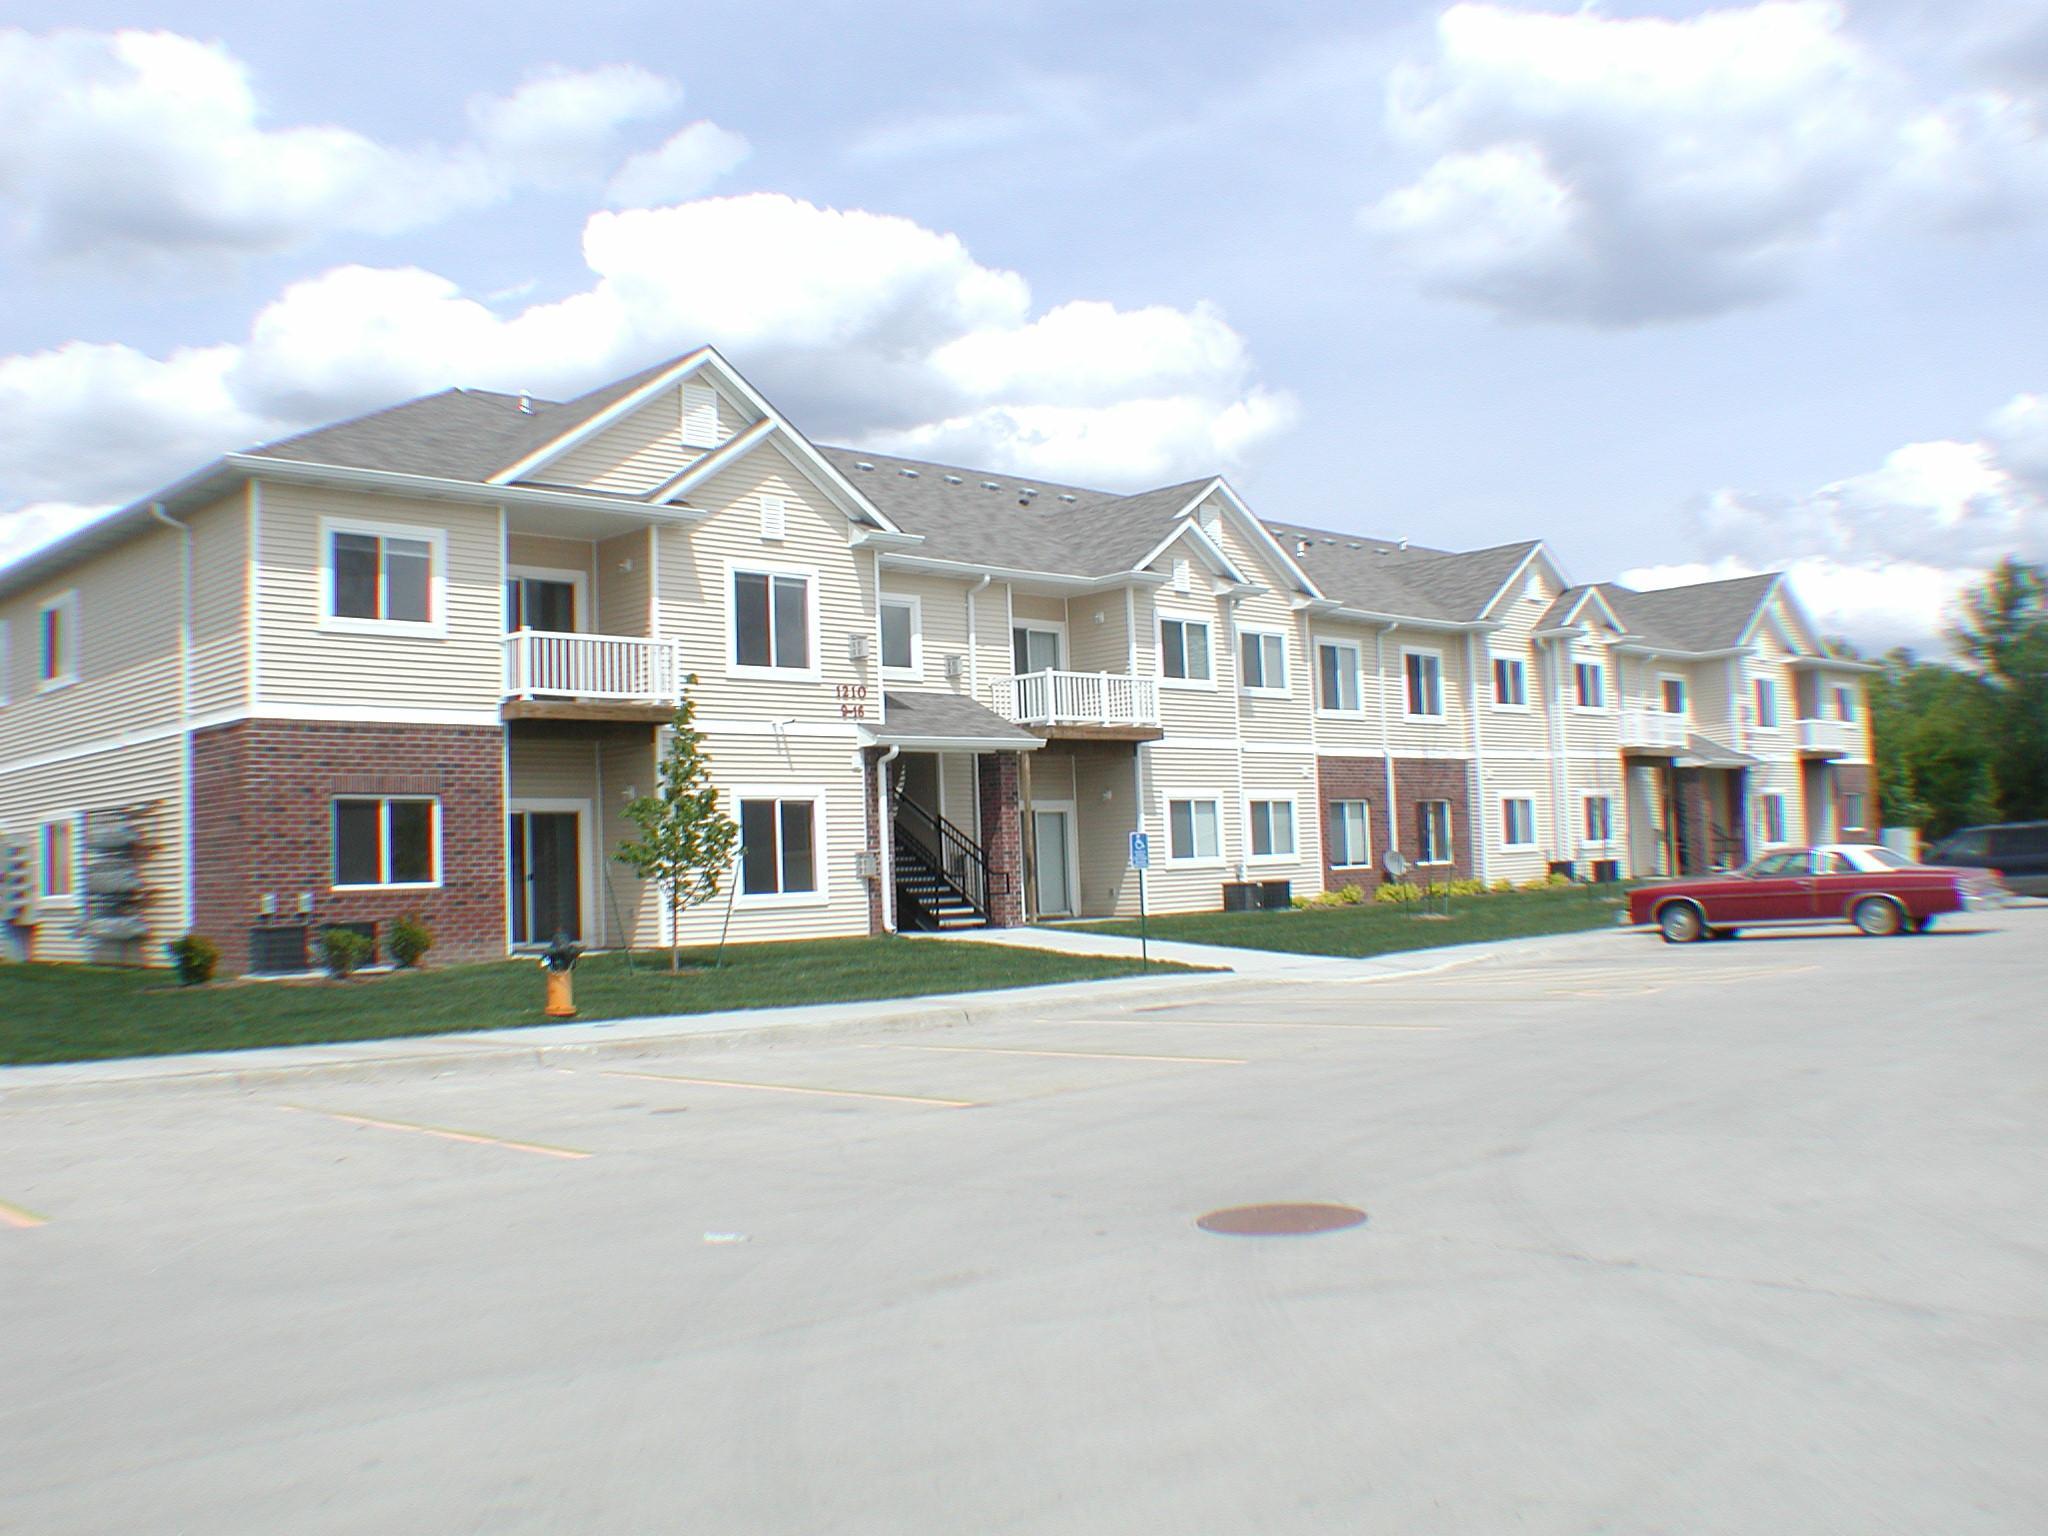 Ankeny iowa ia fsbo homes for sale ankeny by owner for Home builders ankeny iowa